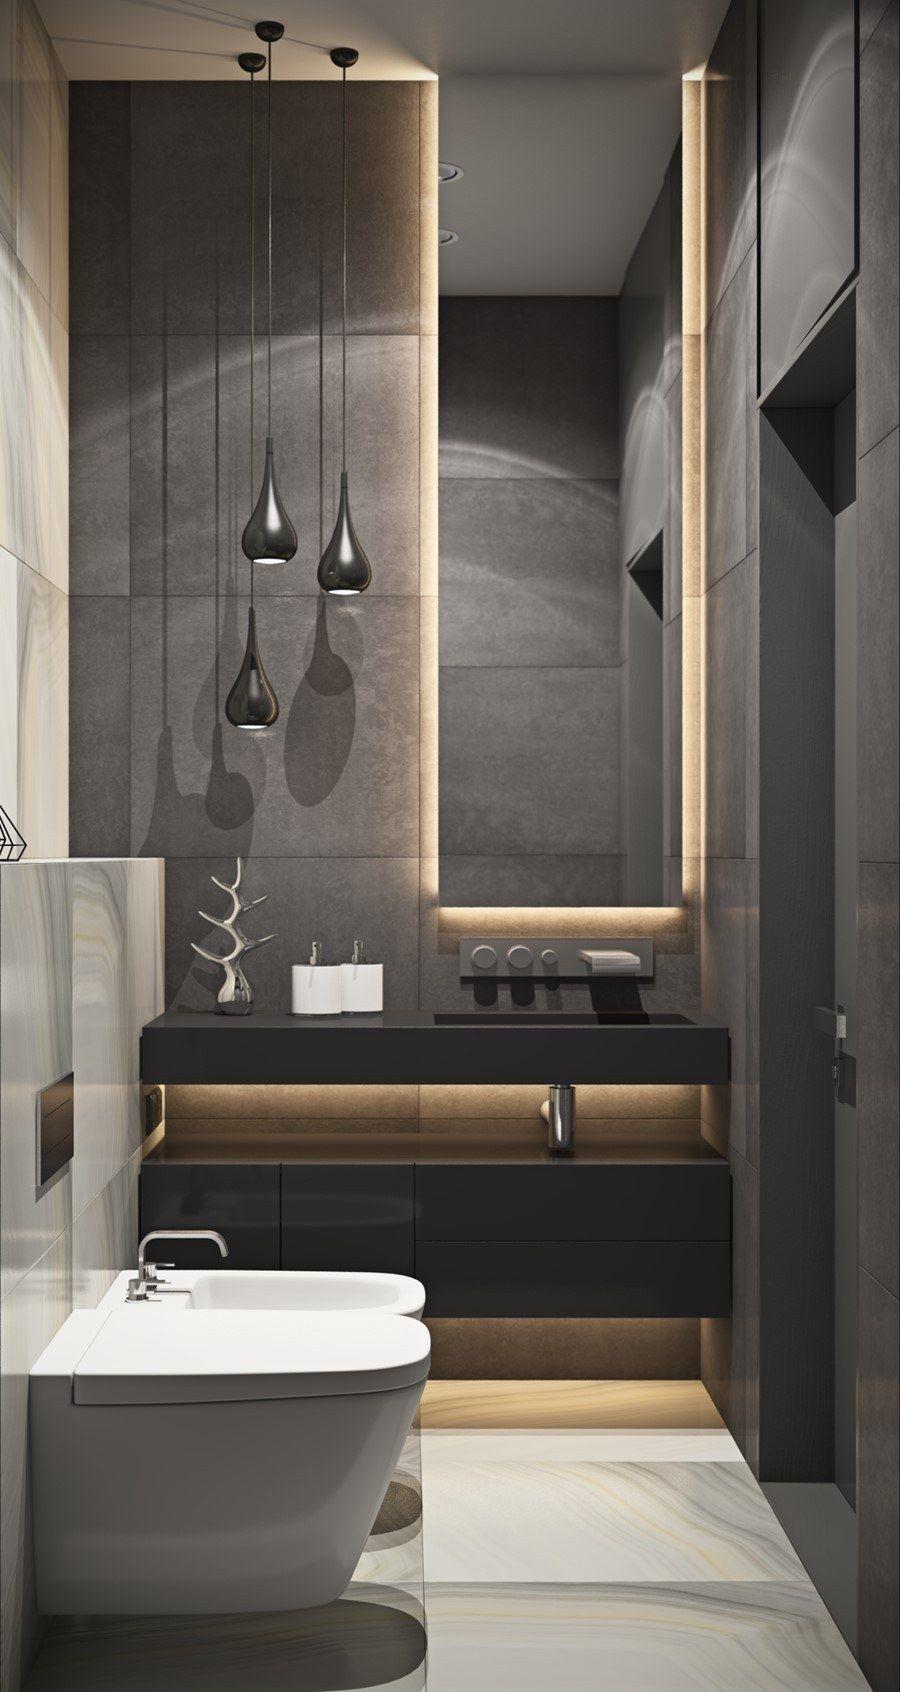 30 Modern Bathroom Ideas Luxury Bathrooms Homelovr Modern Bathroom Design Modern Bathroom Bathroom Interior